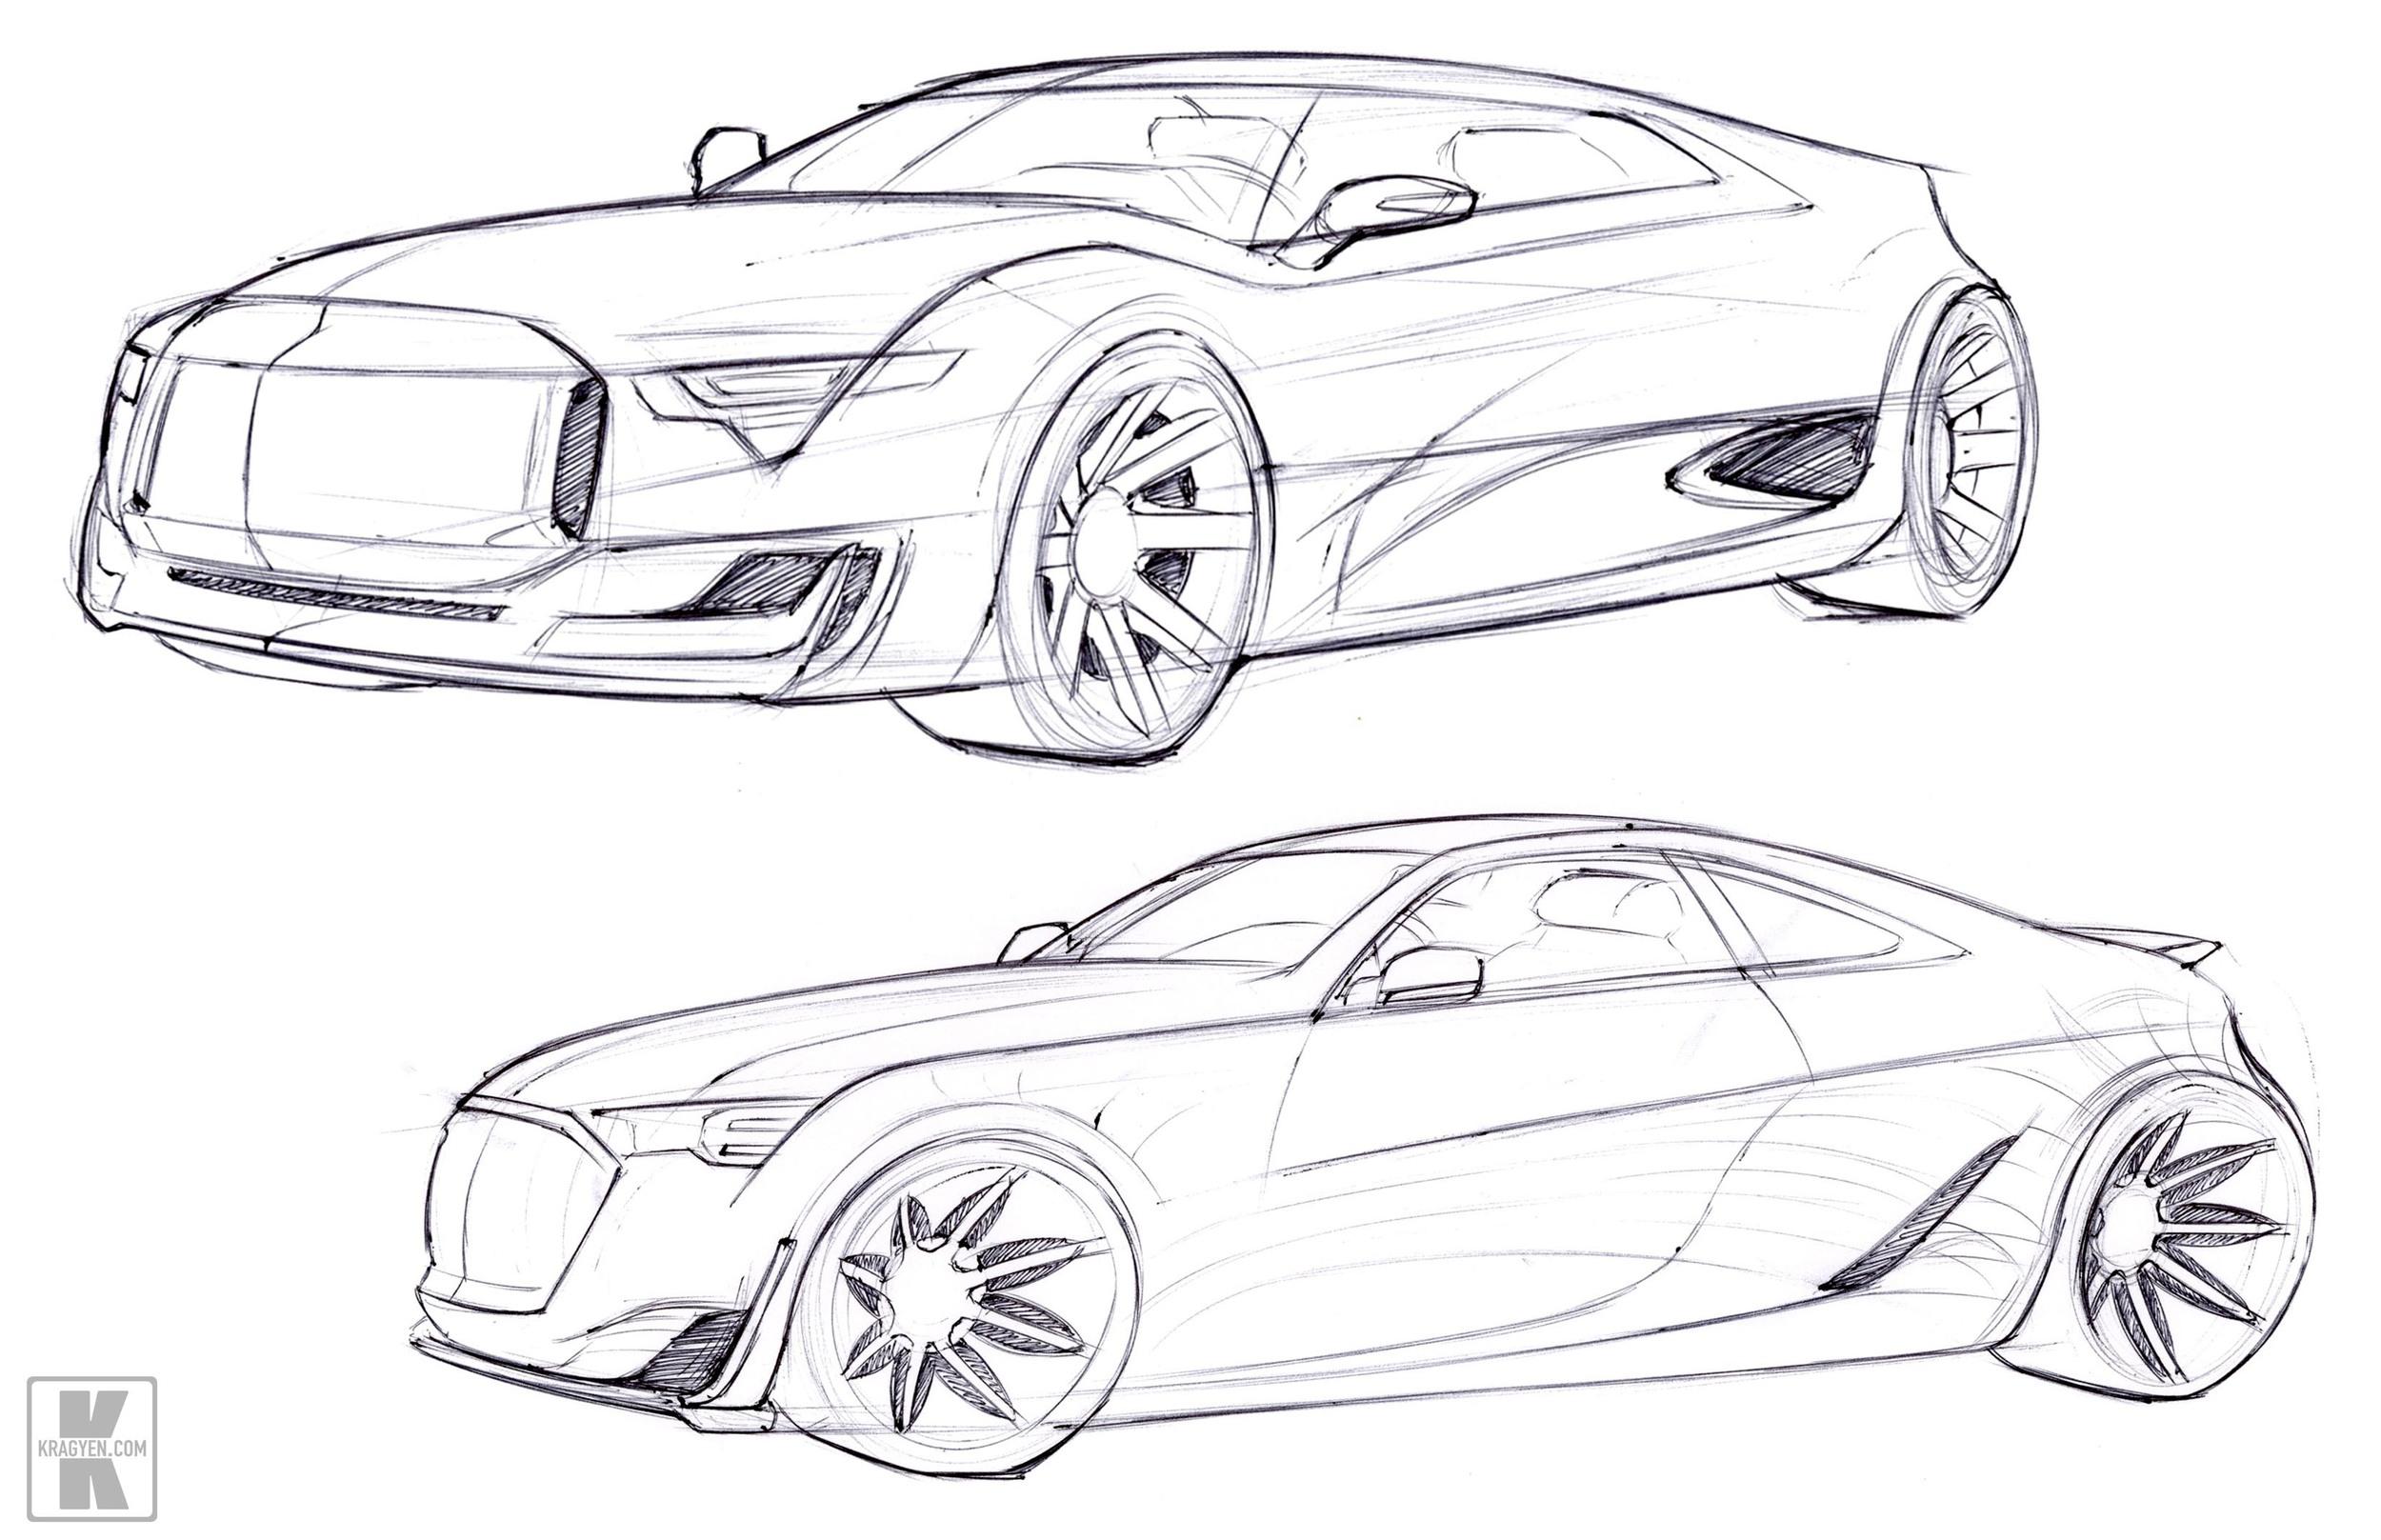 LuxurySedanCars2.jpg